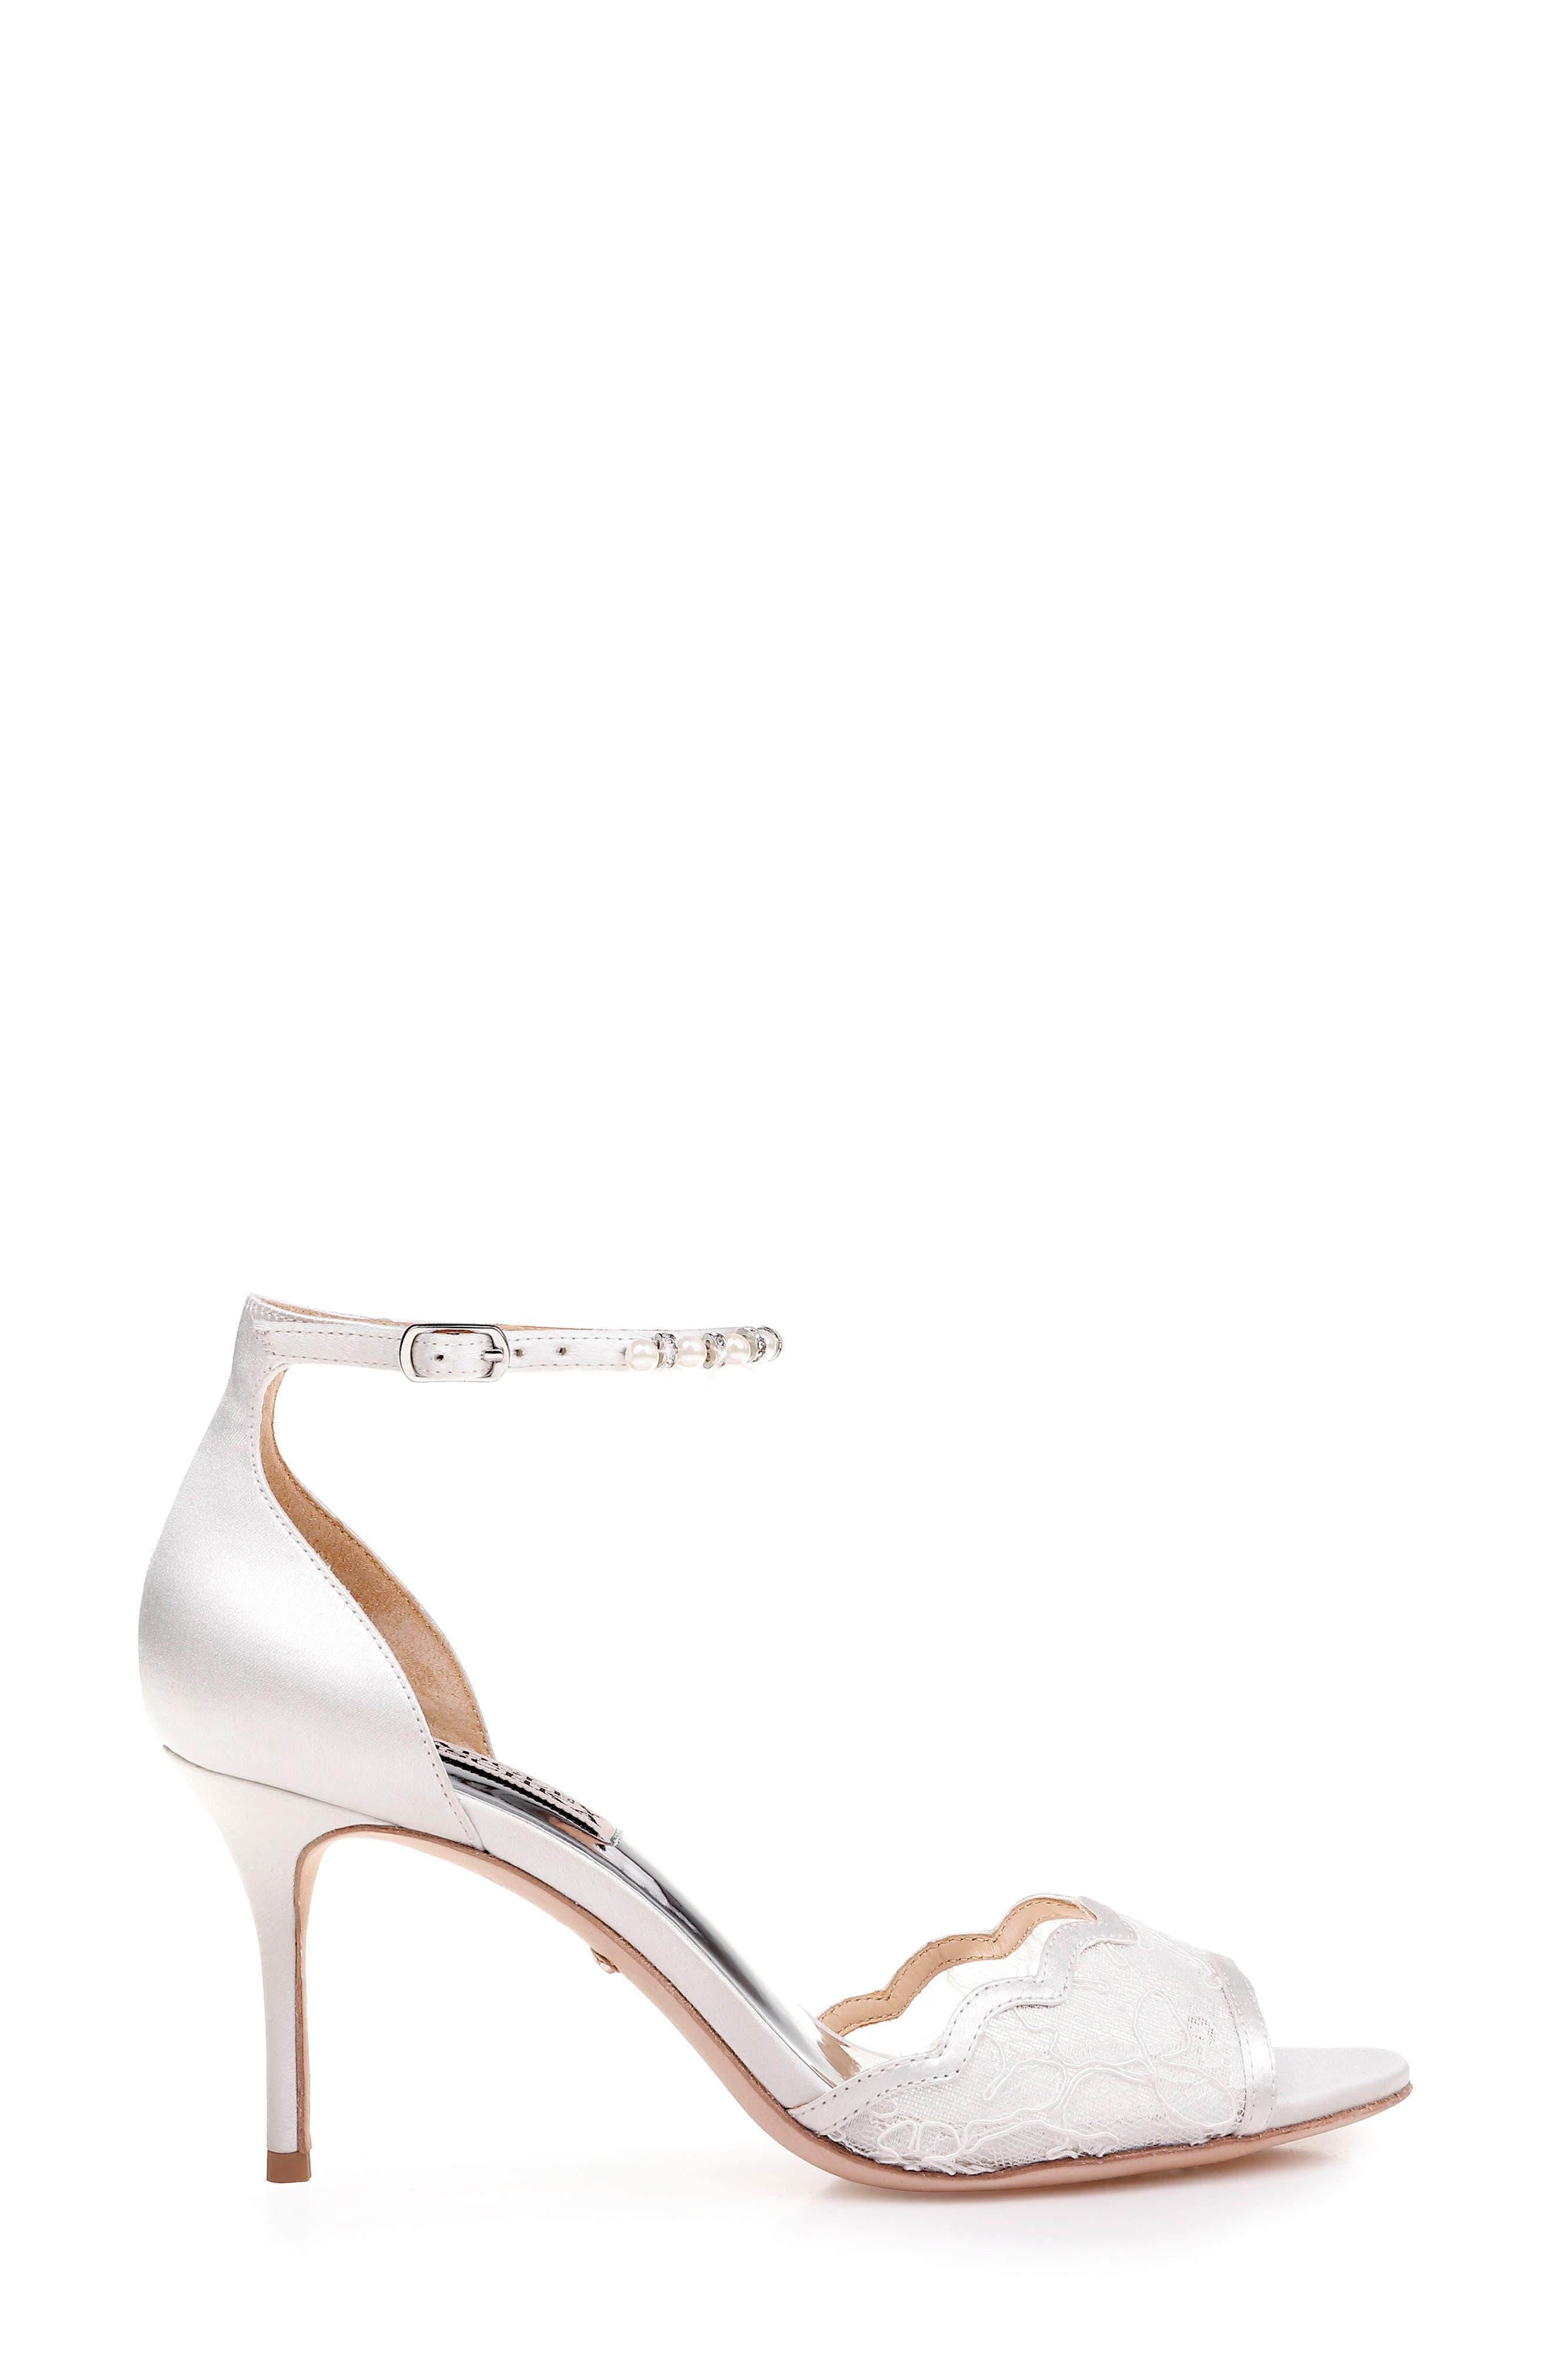 BADGLEY MISCHKA COLLECTION,                             Badgley Mischka Lenora Ankle Strap Sandal,                             Alternate thumbnail 3, color,                             SOFT WHITE FABRIC/ SATIN